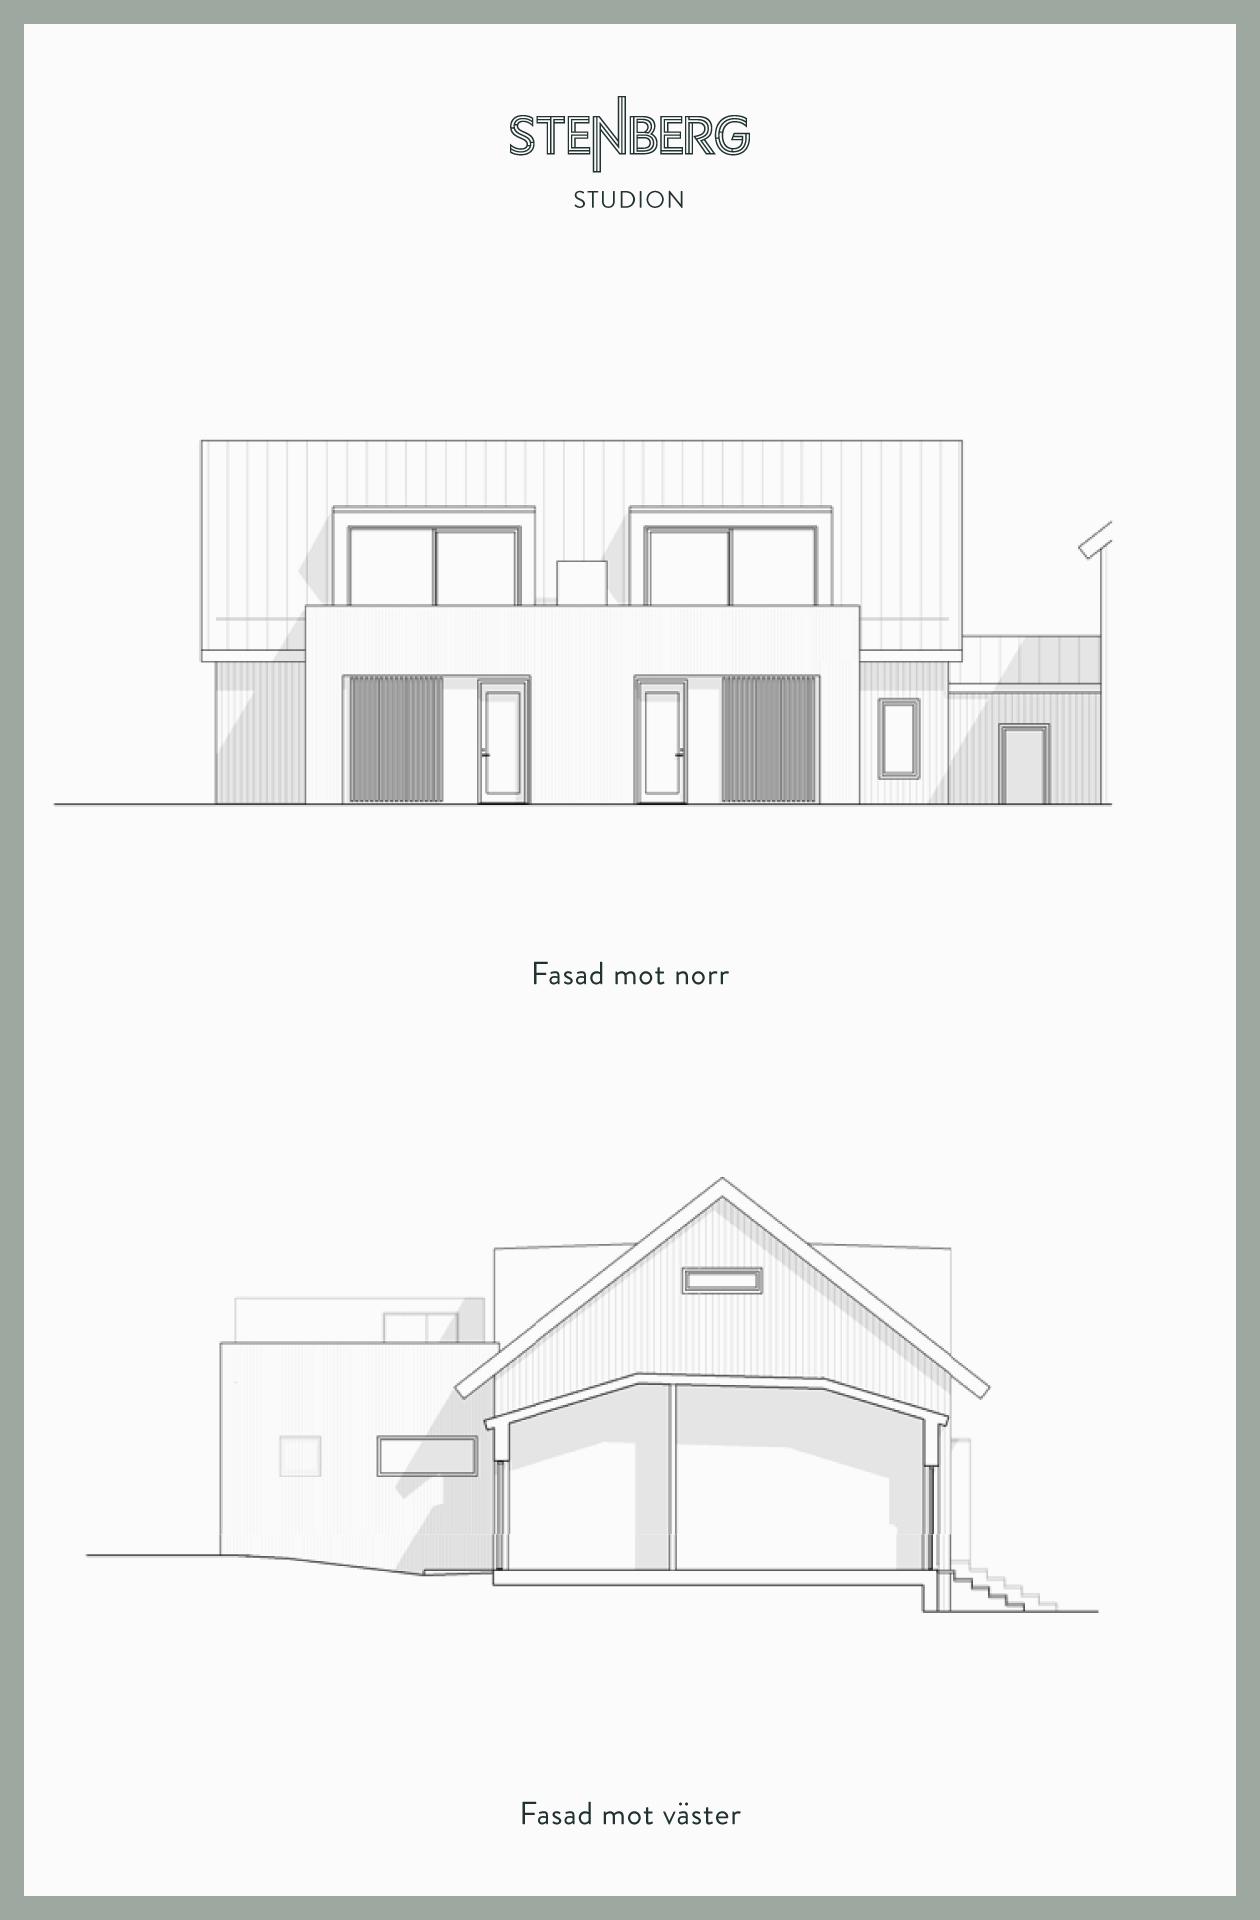 Stenberg-ritningar-Studion 3.jpg